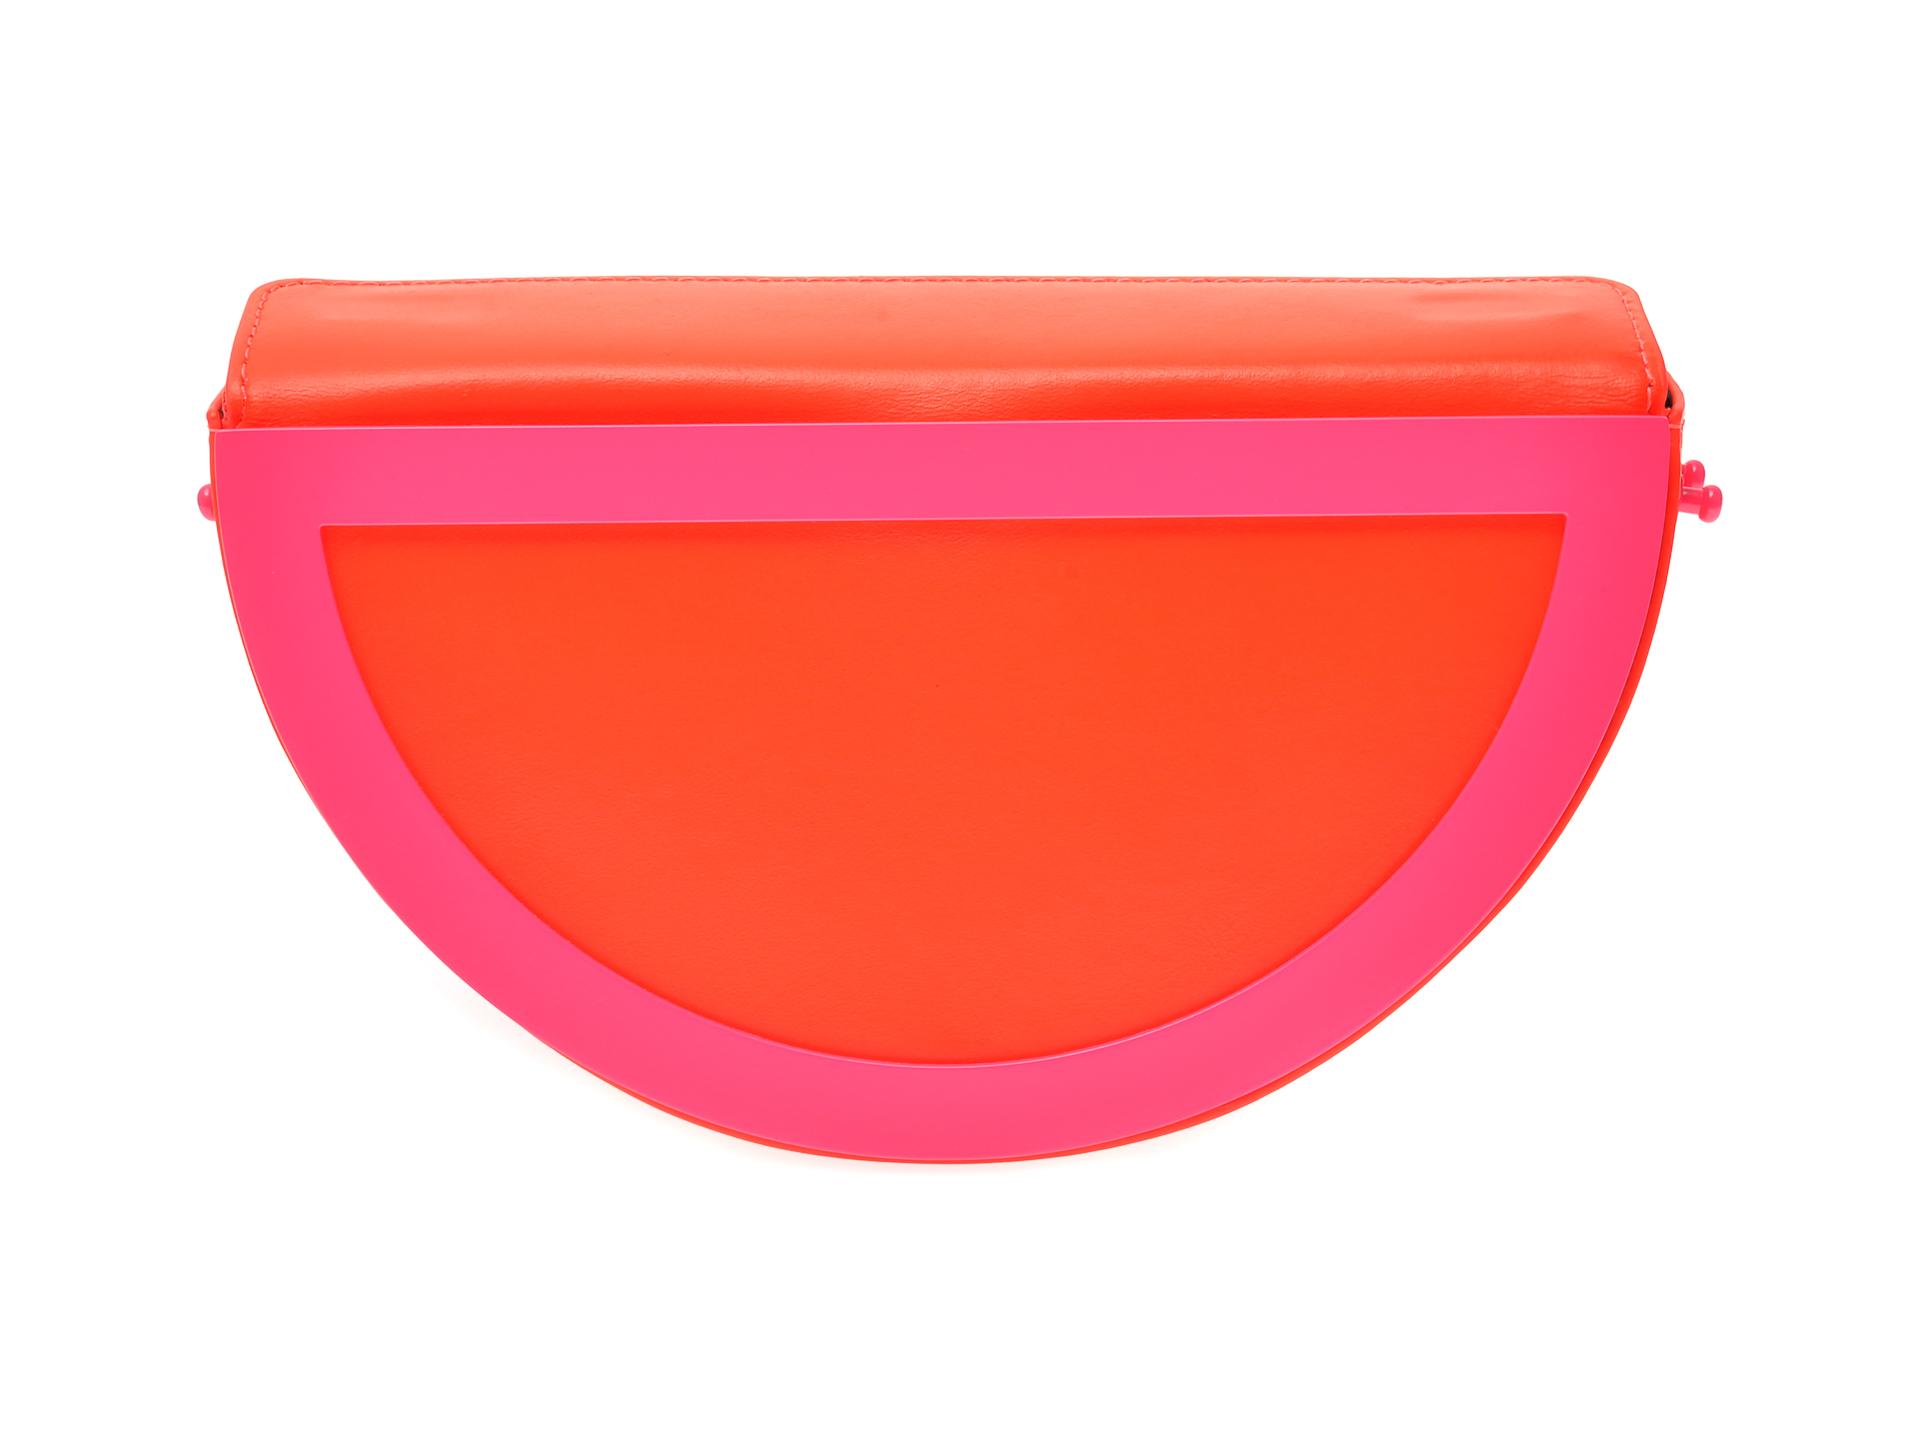 Poseta plic EPICA portocalie, YANG, din piele naturala imagine